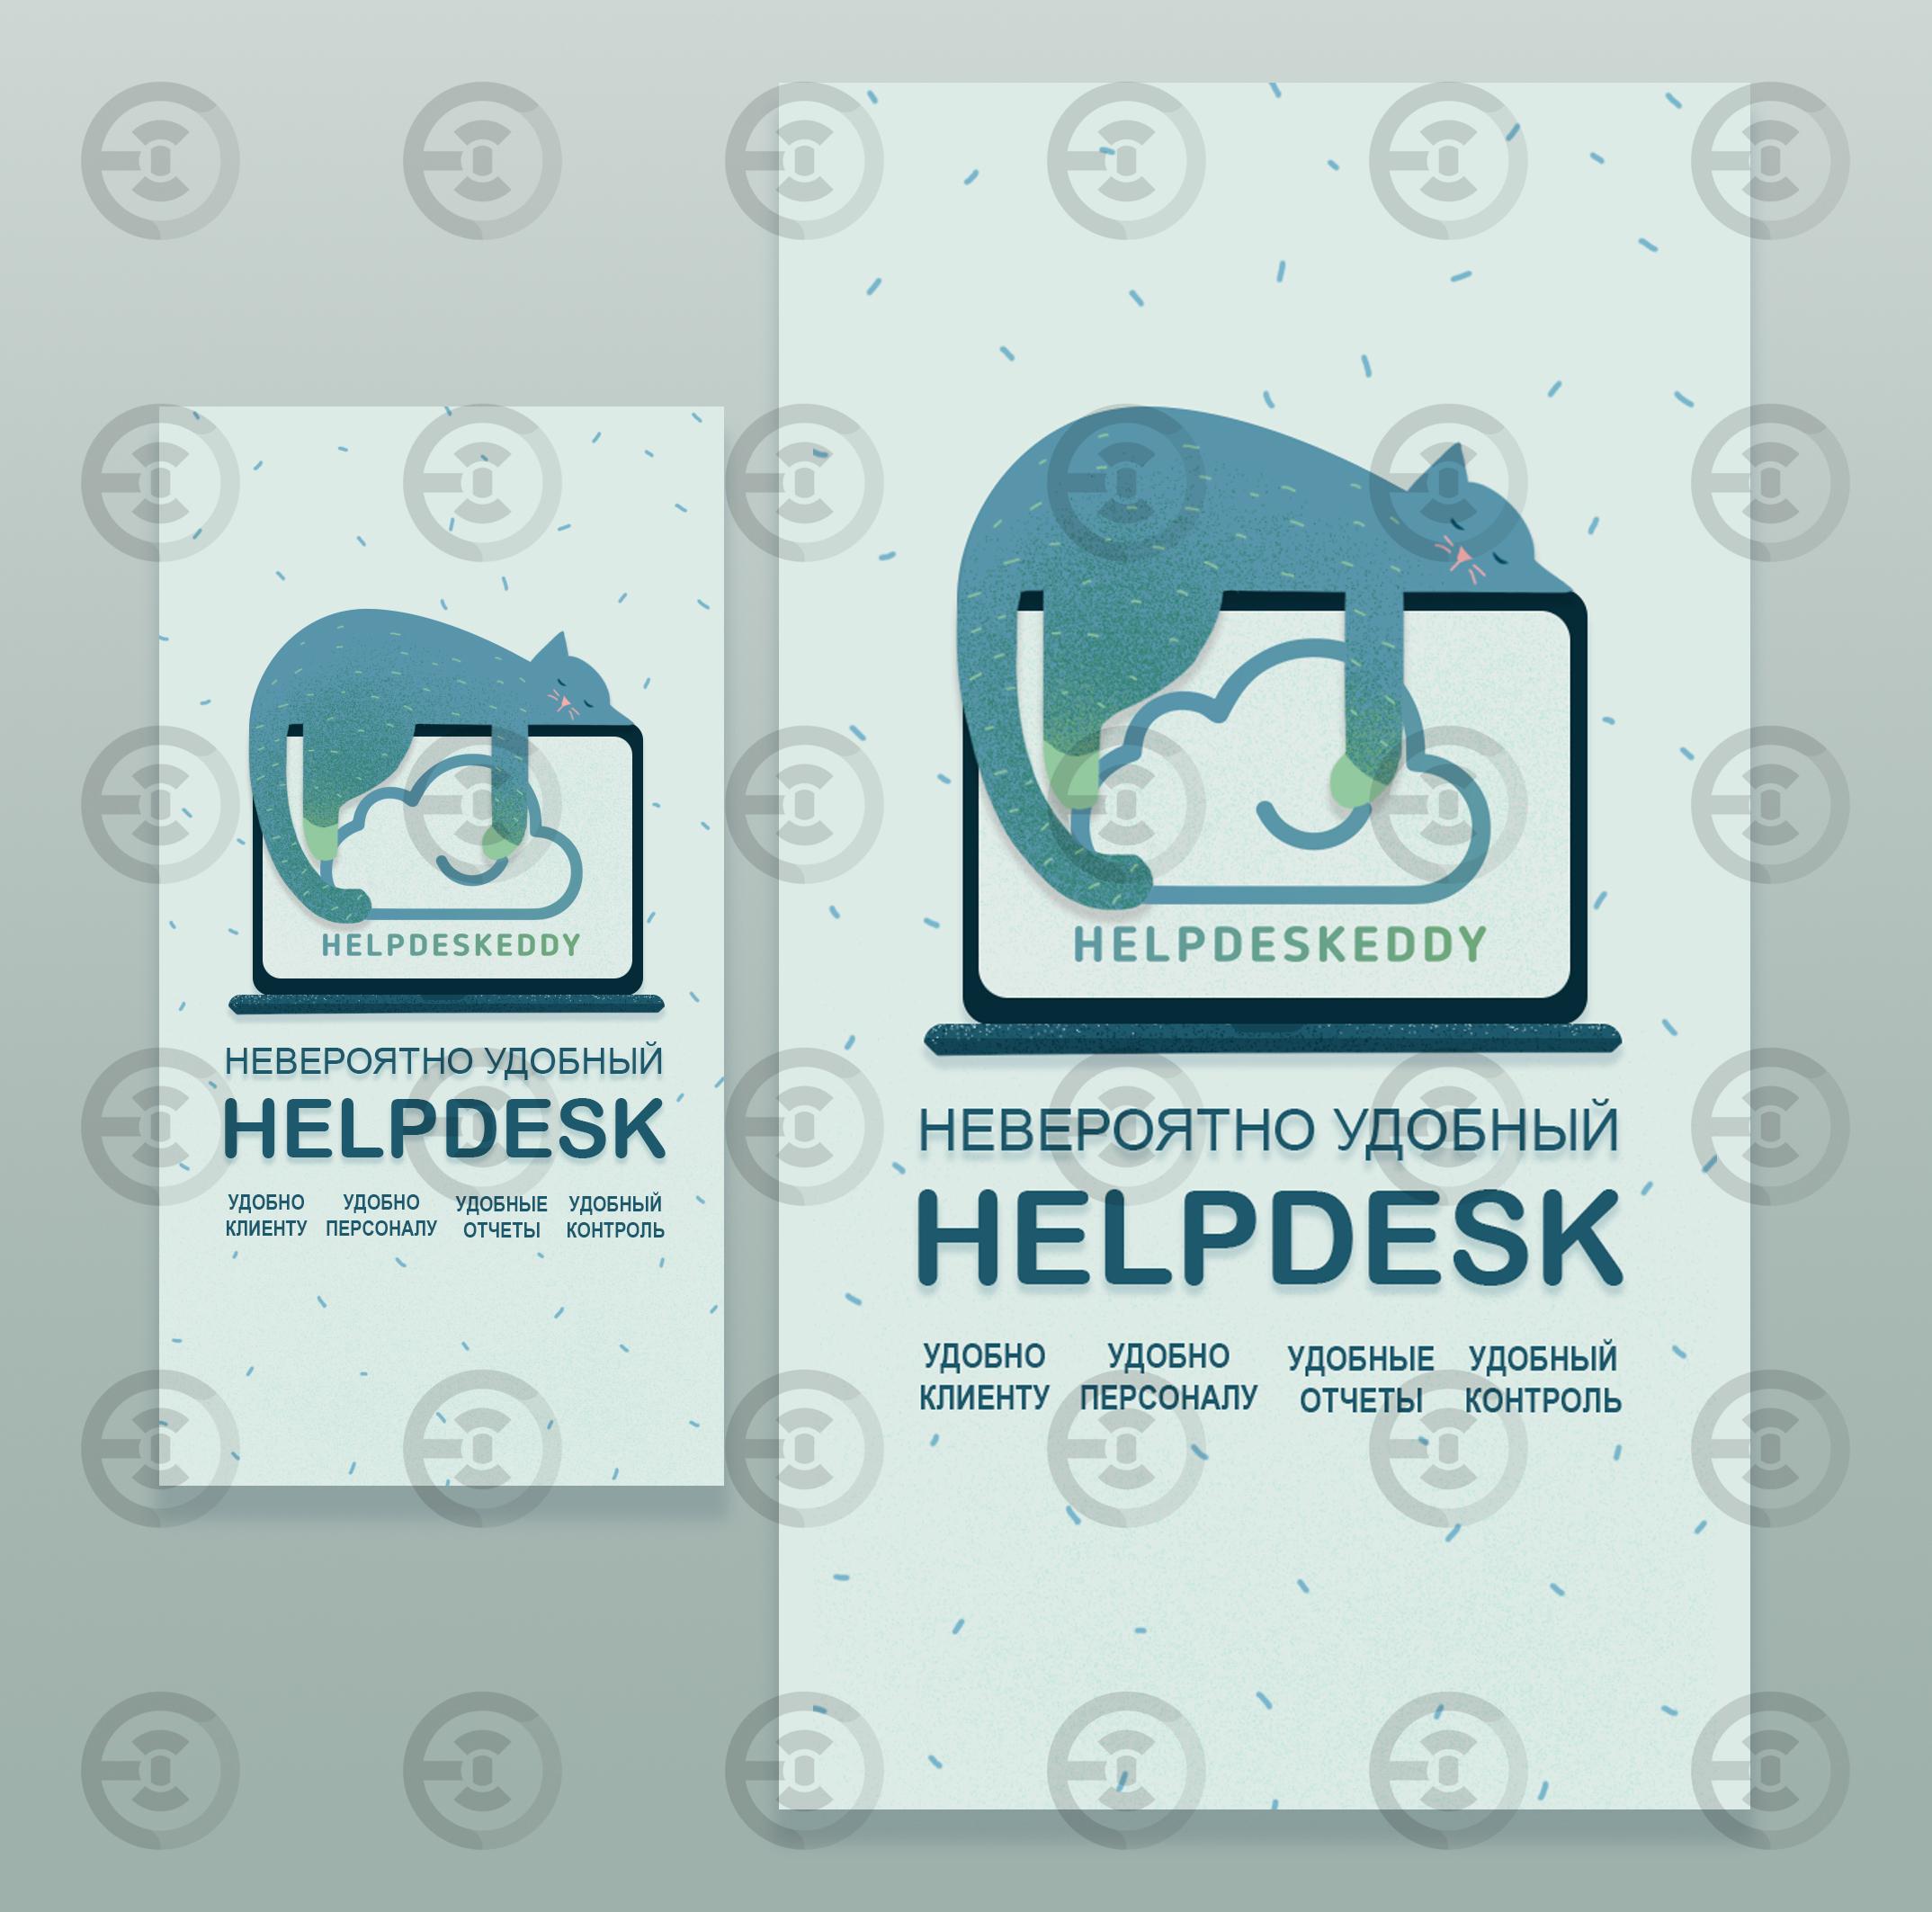 HELPDESK.jpg